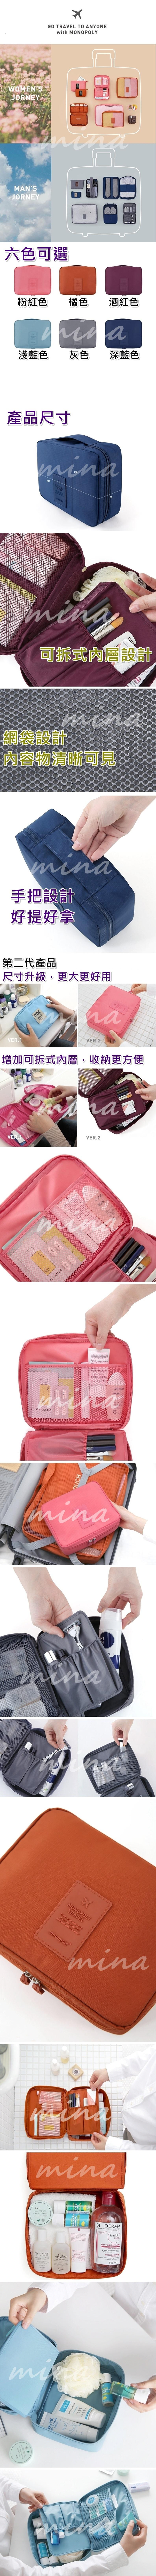 B00012 旅行化妝包盥洗包 長條圖1-pchome